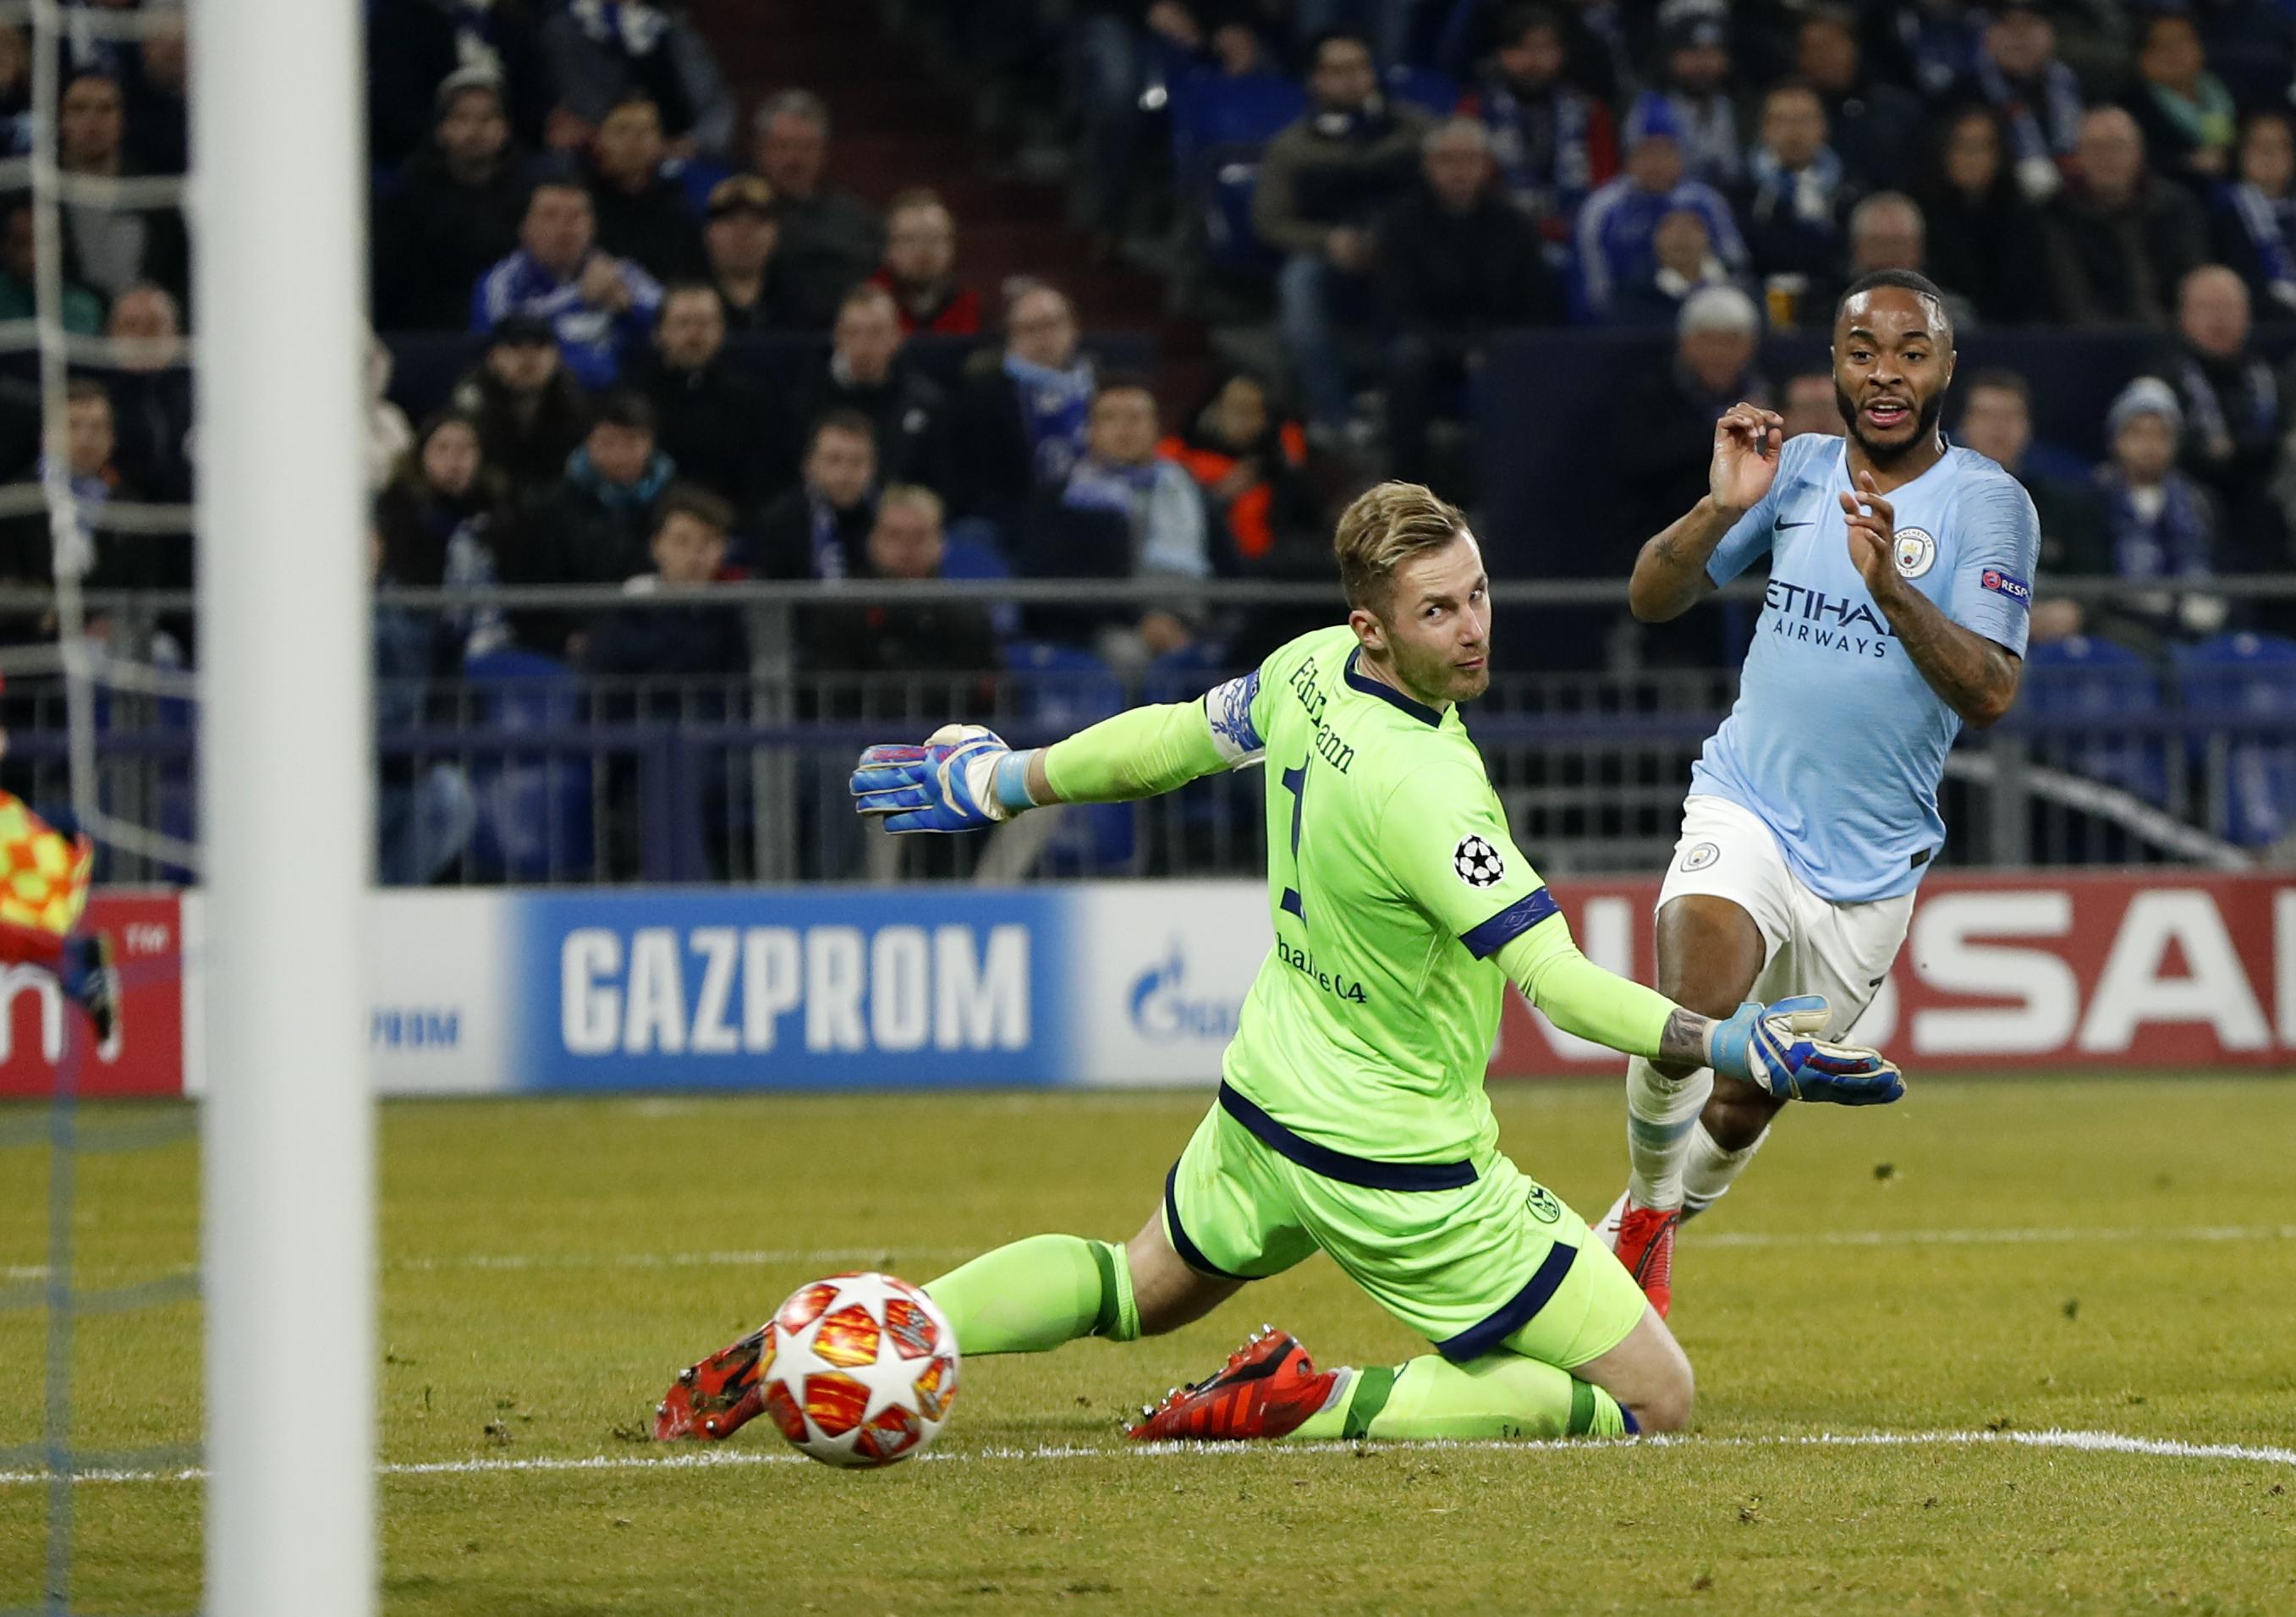 Raheem Sterling anotó el tanto de la victoria del Manchester City contra el Schalke. (Foto Prensa Libre: AFP)